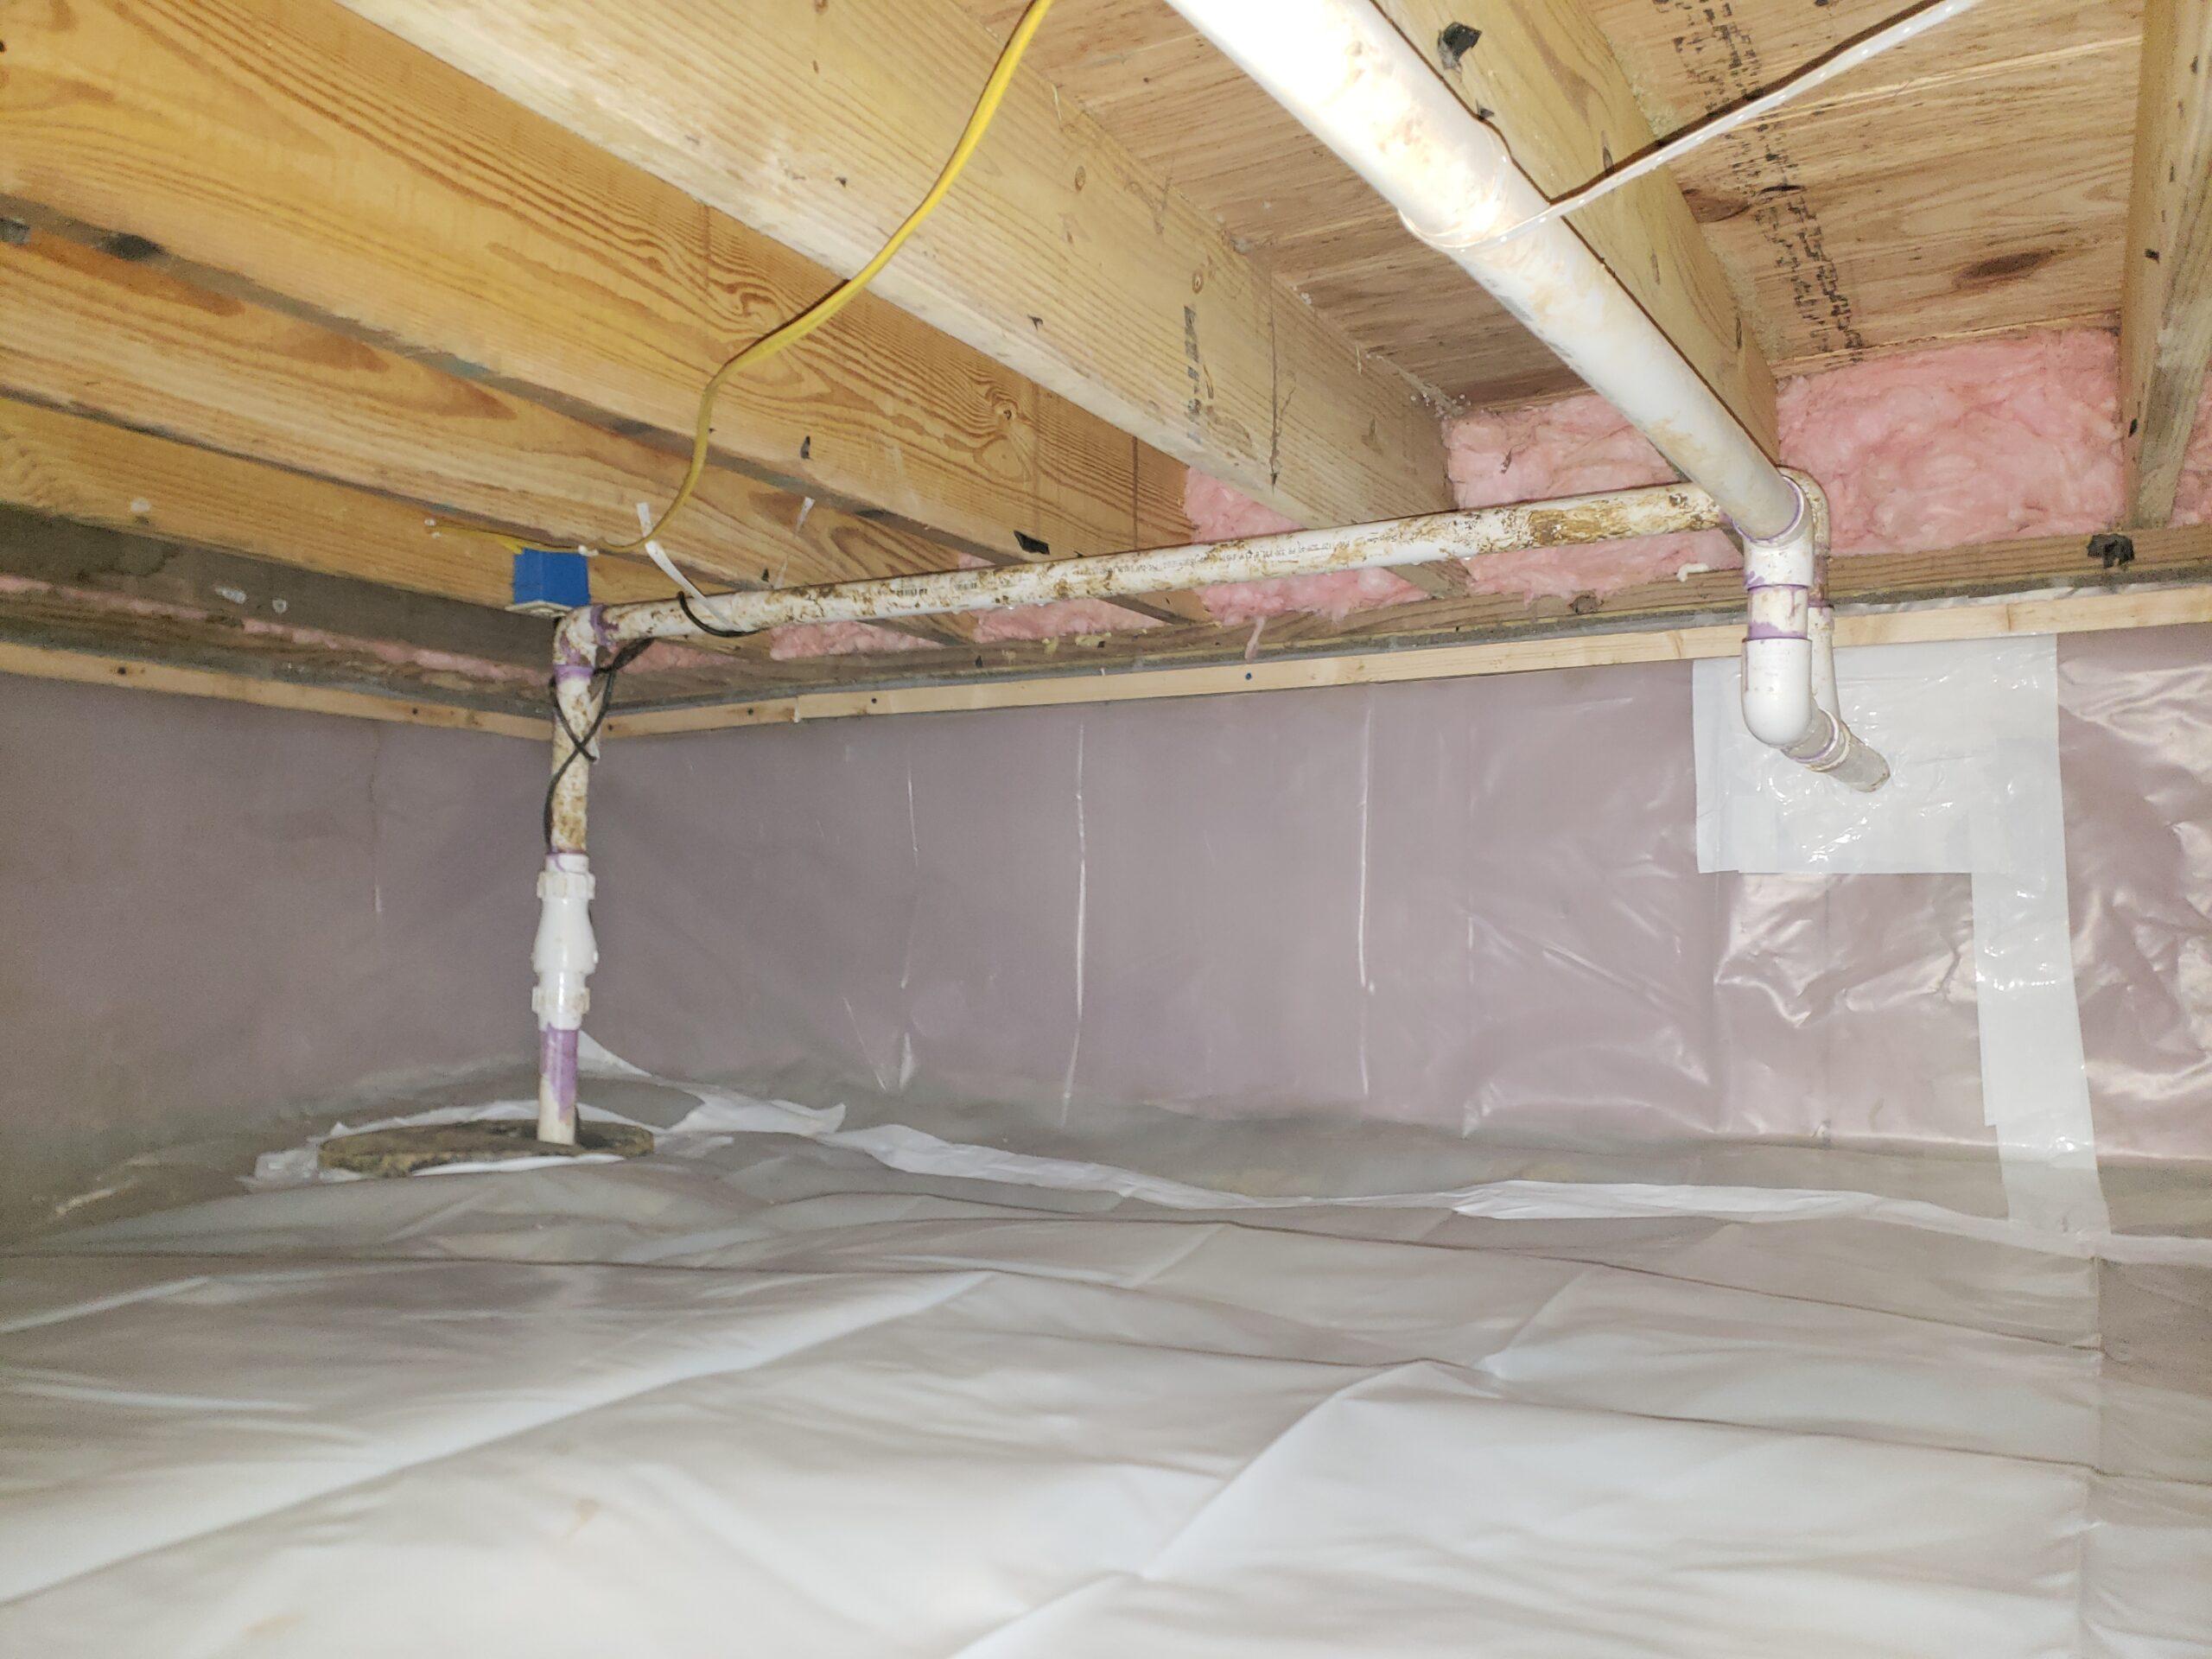 Benefits of Hiring a Professional Waterproofing Contractor